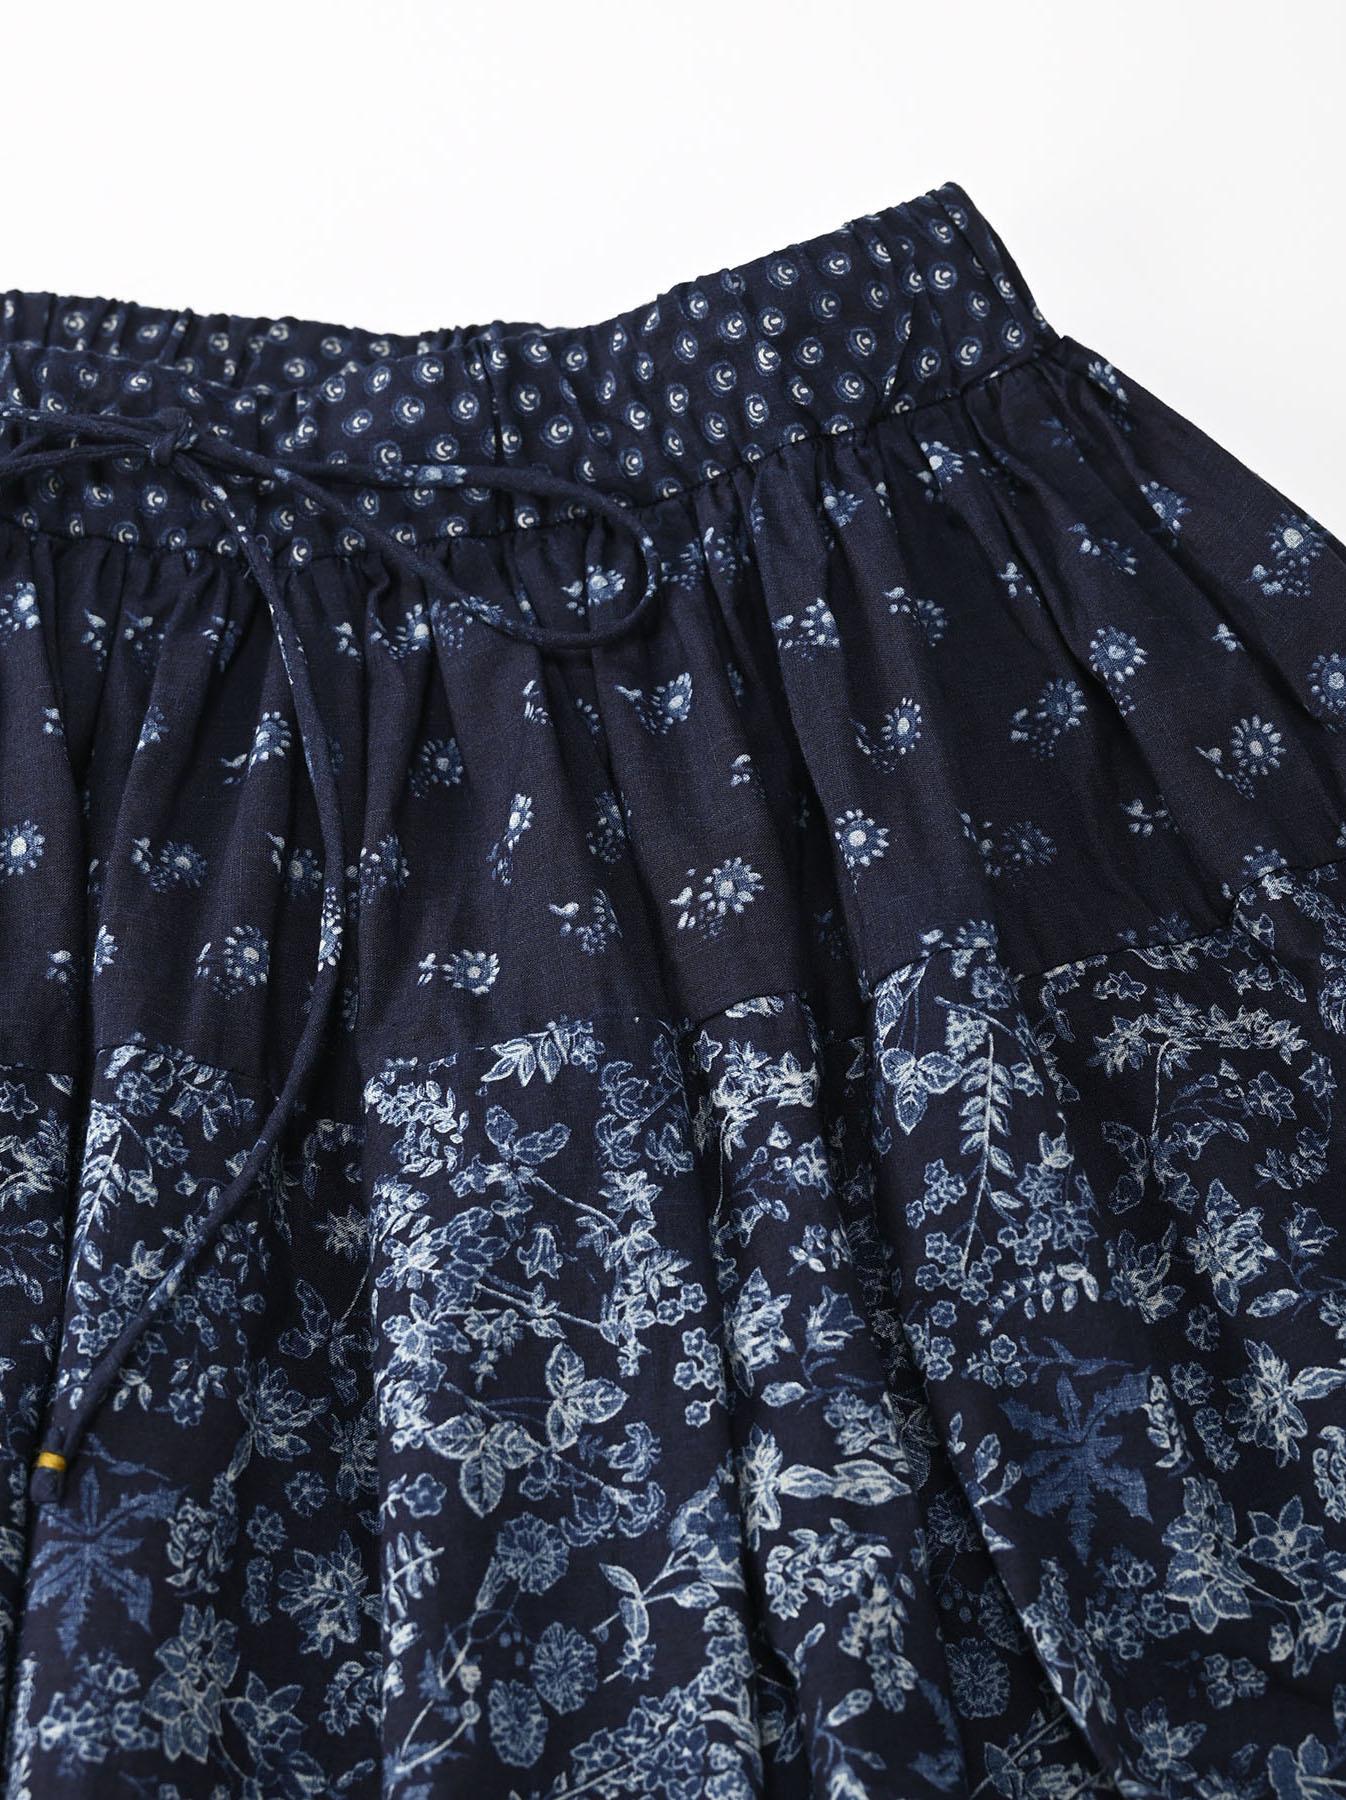 Indigo Tappet Flower Patchwork Skirt-6